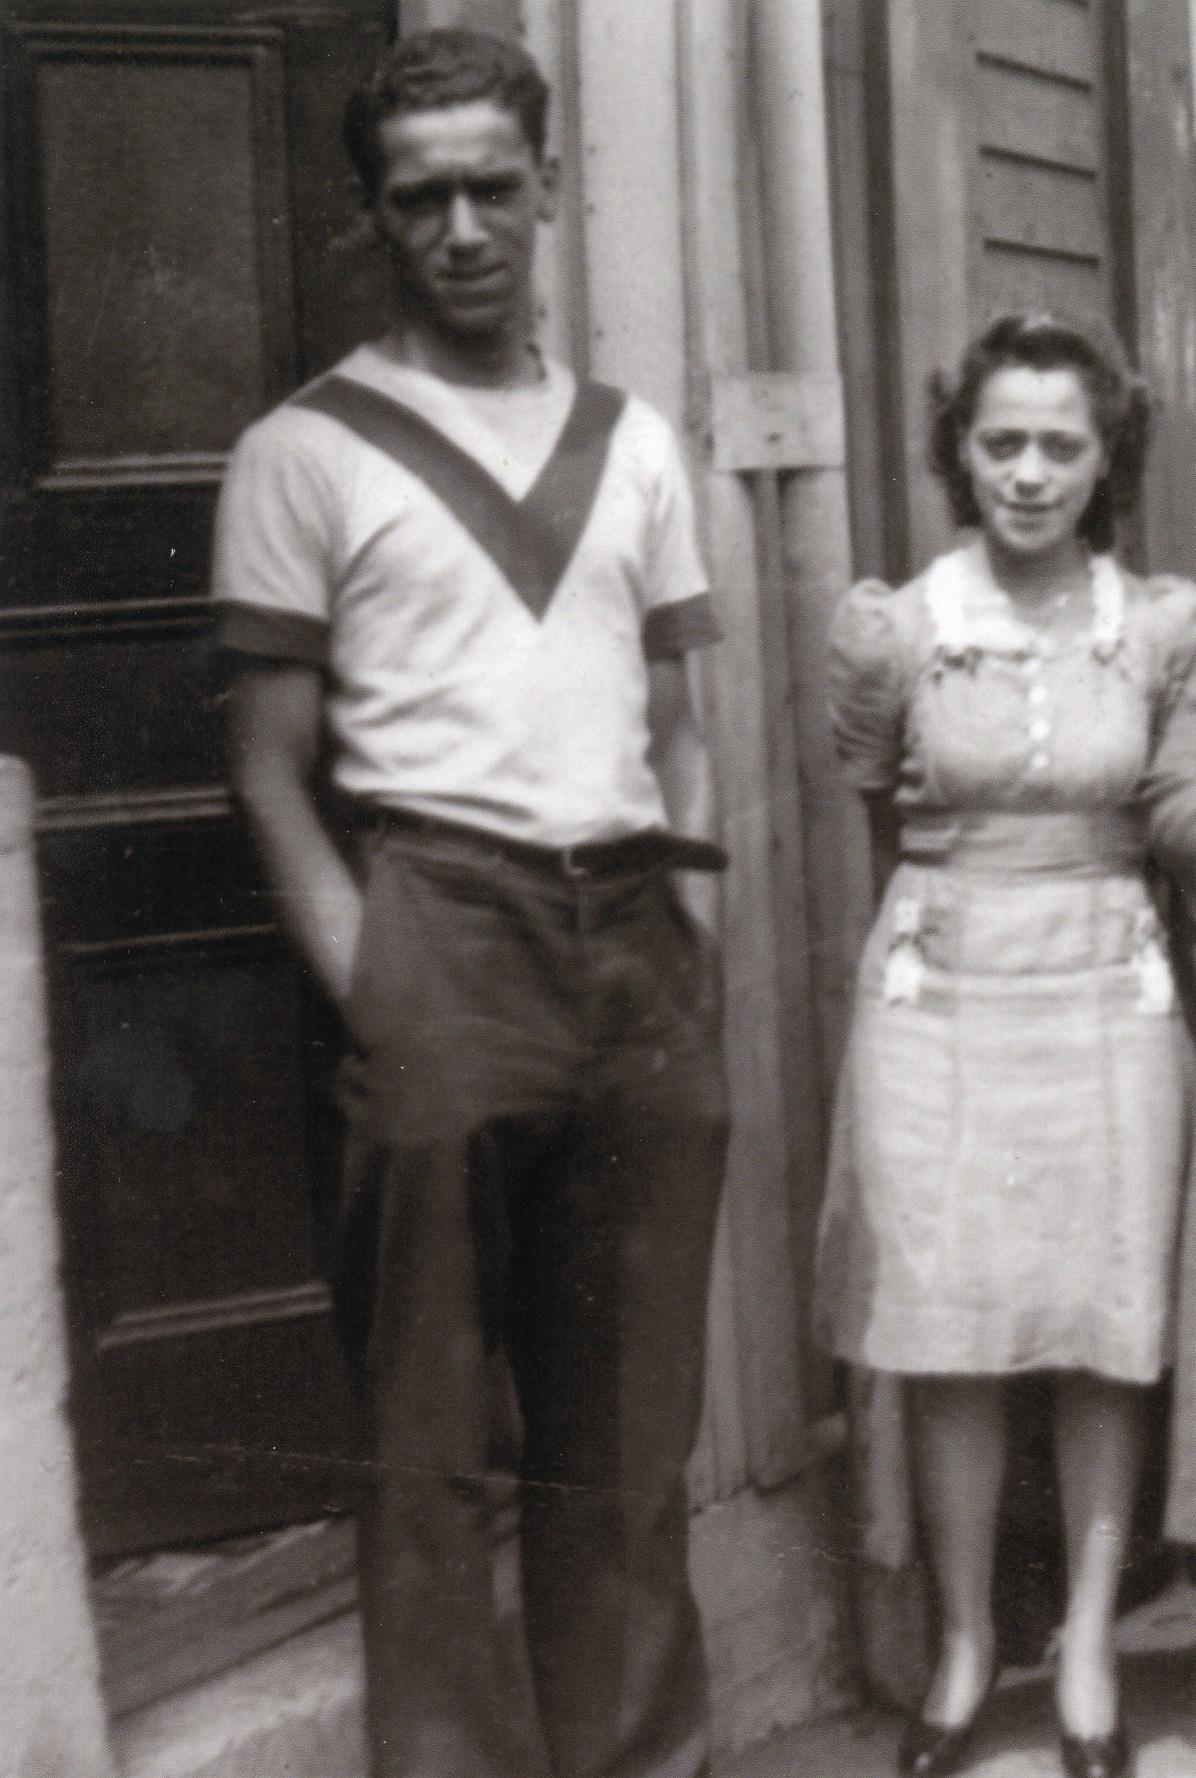 Viola and Jack Desmond